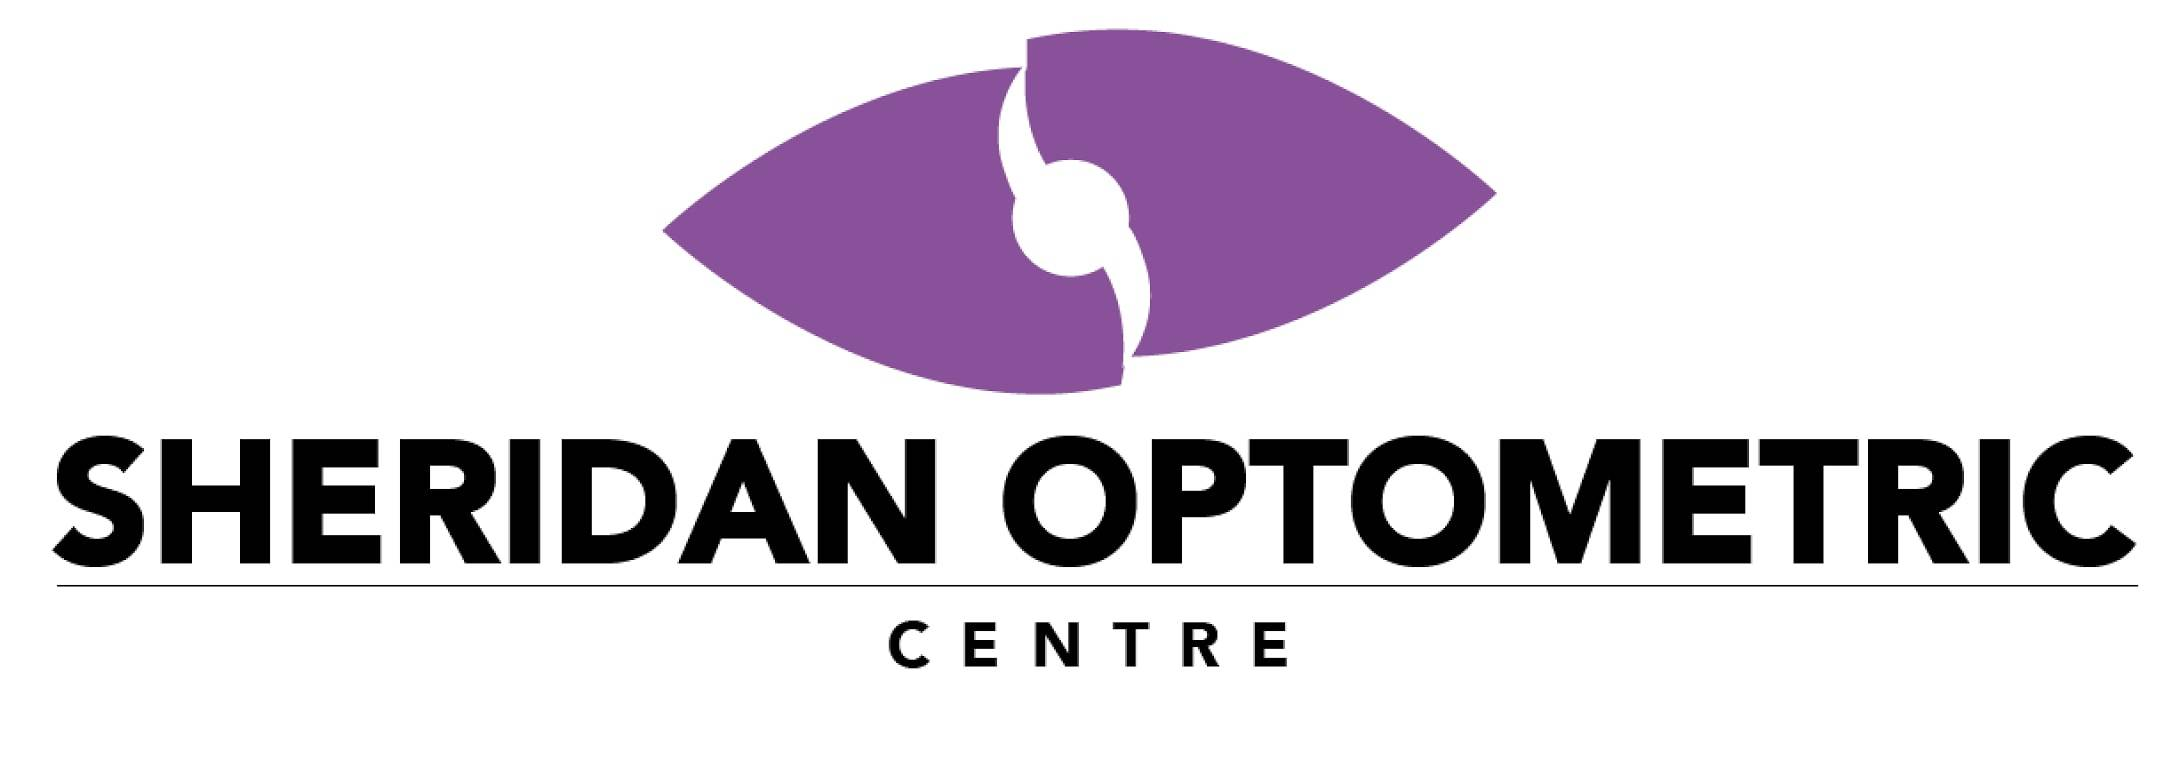 Sheridan Optometric Centre